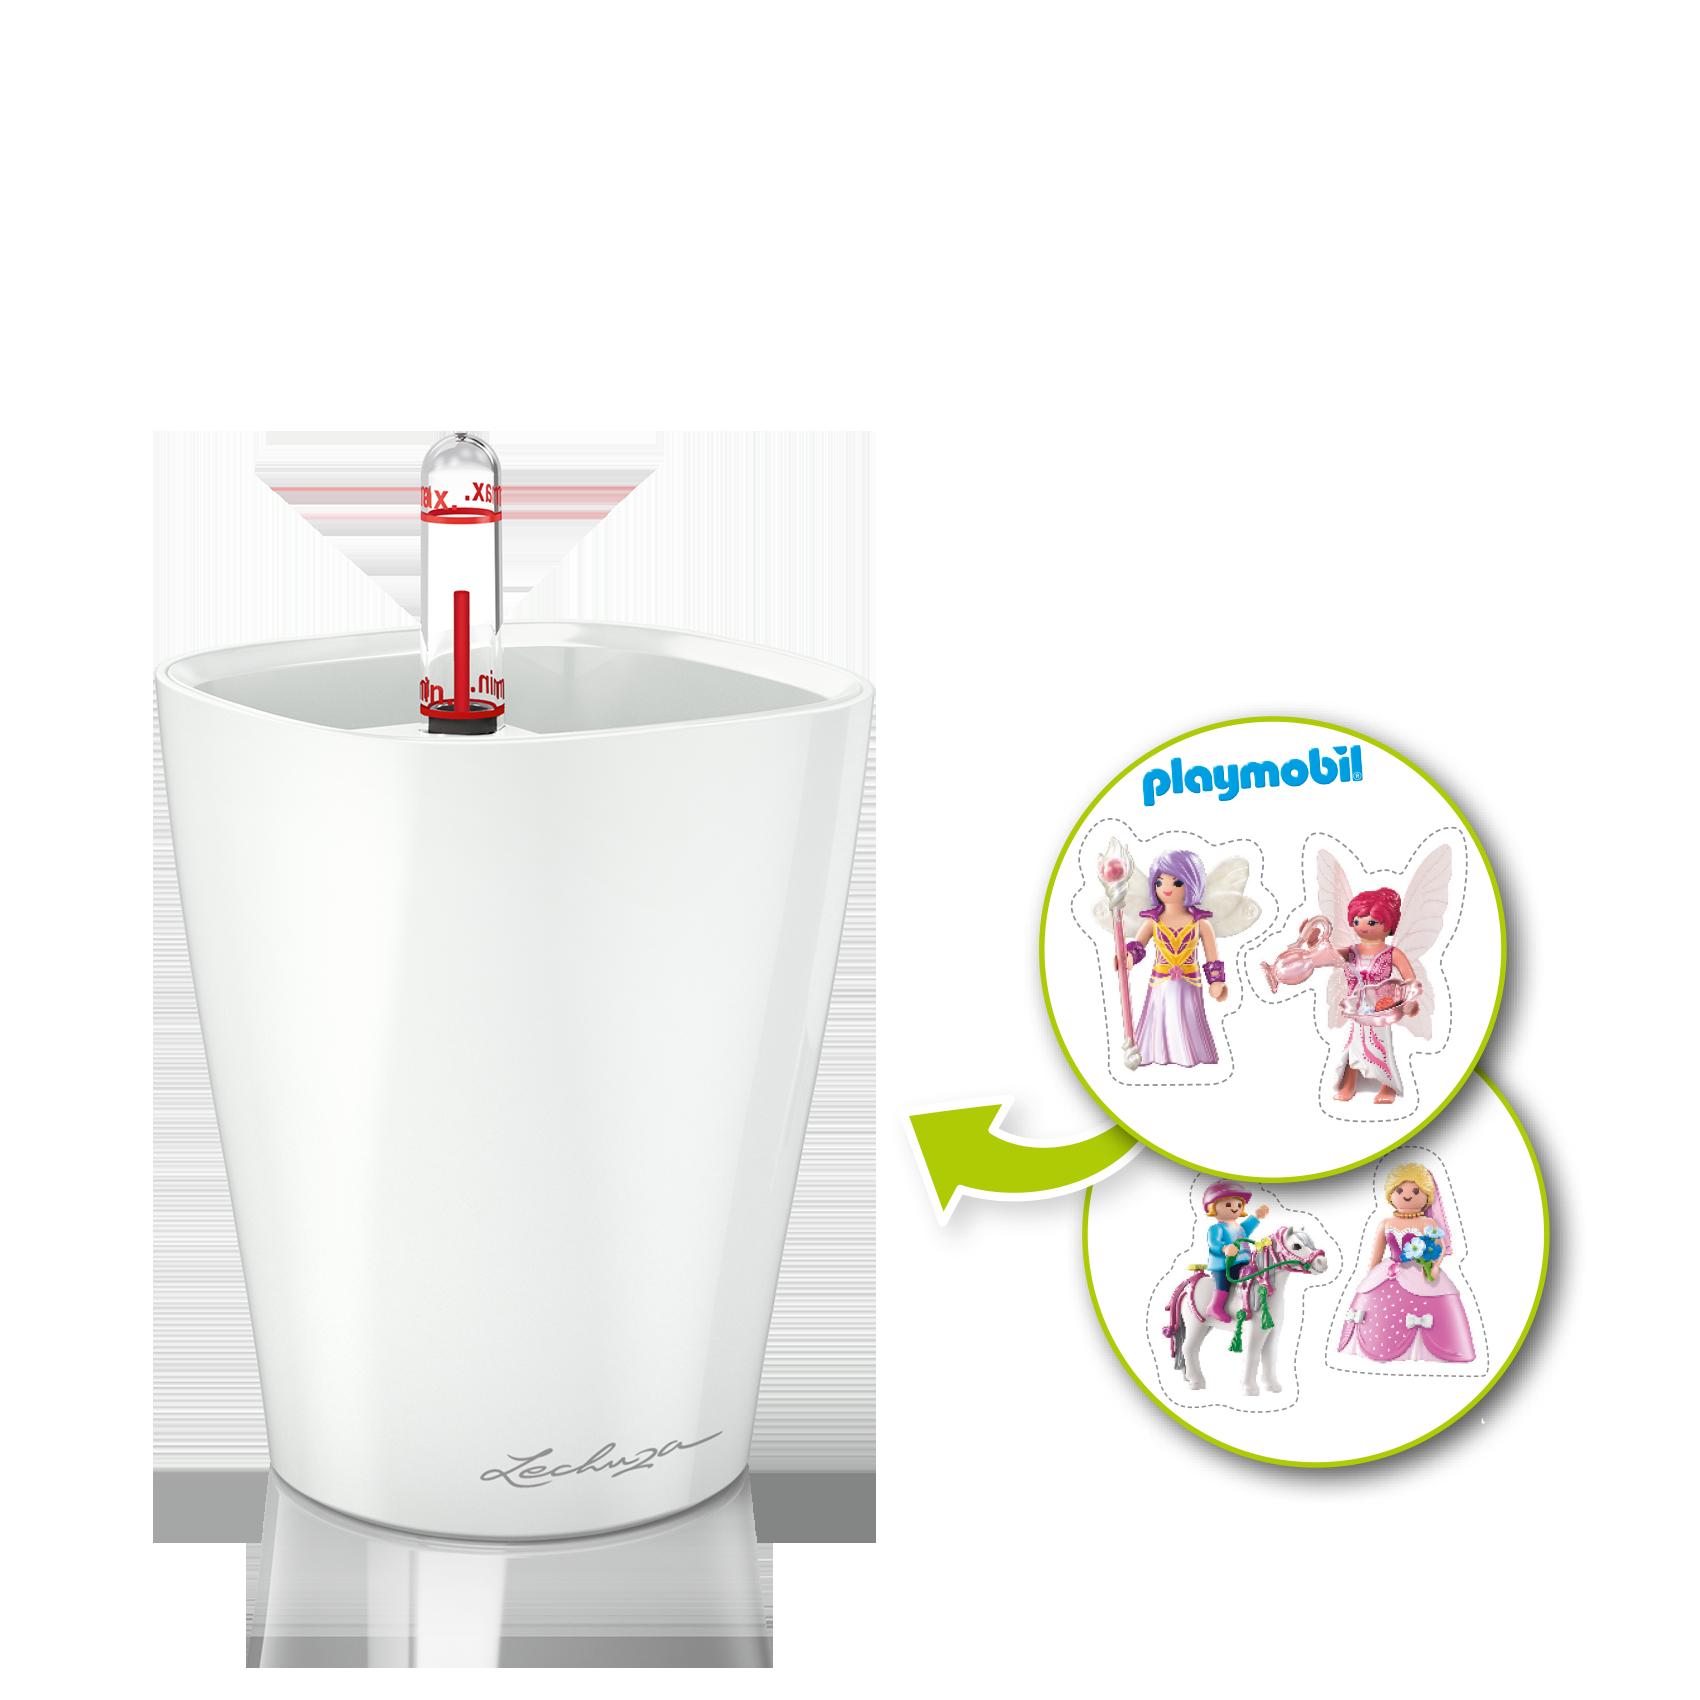 MINI-DELTINI artistic set with pony theme, white semi-gloss